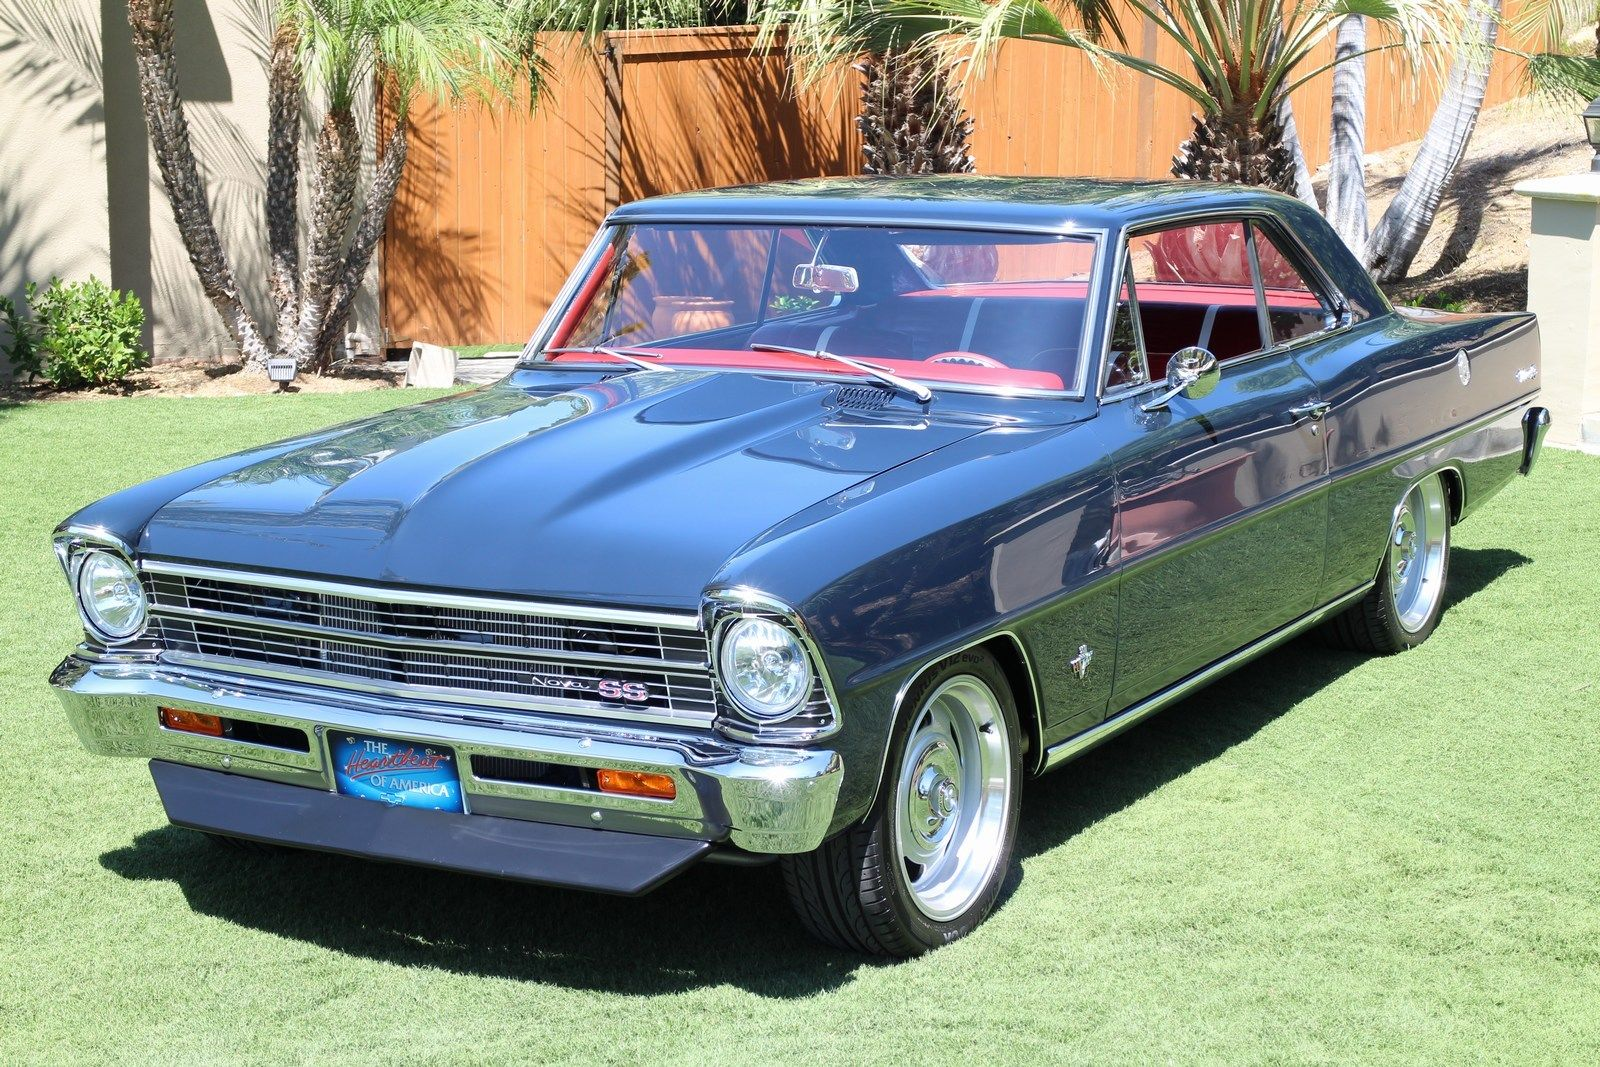 1966 Chevy Impala 4 Door